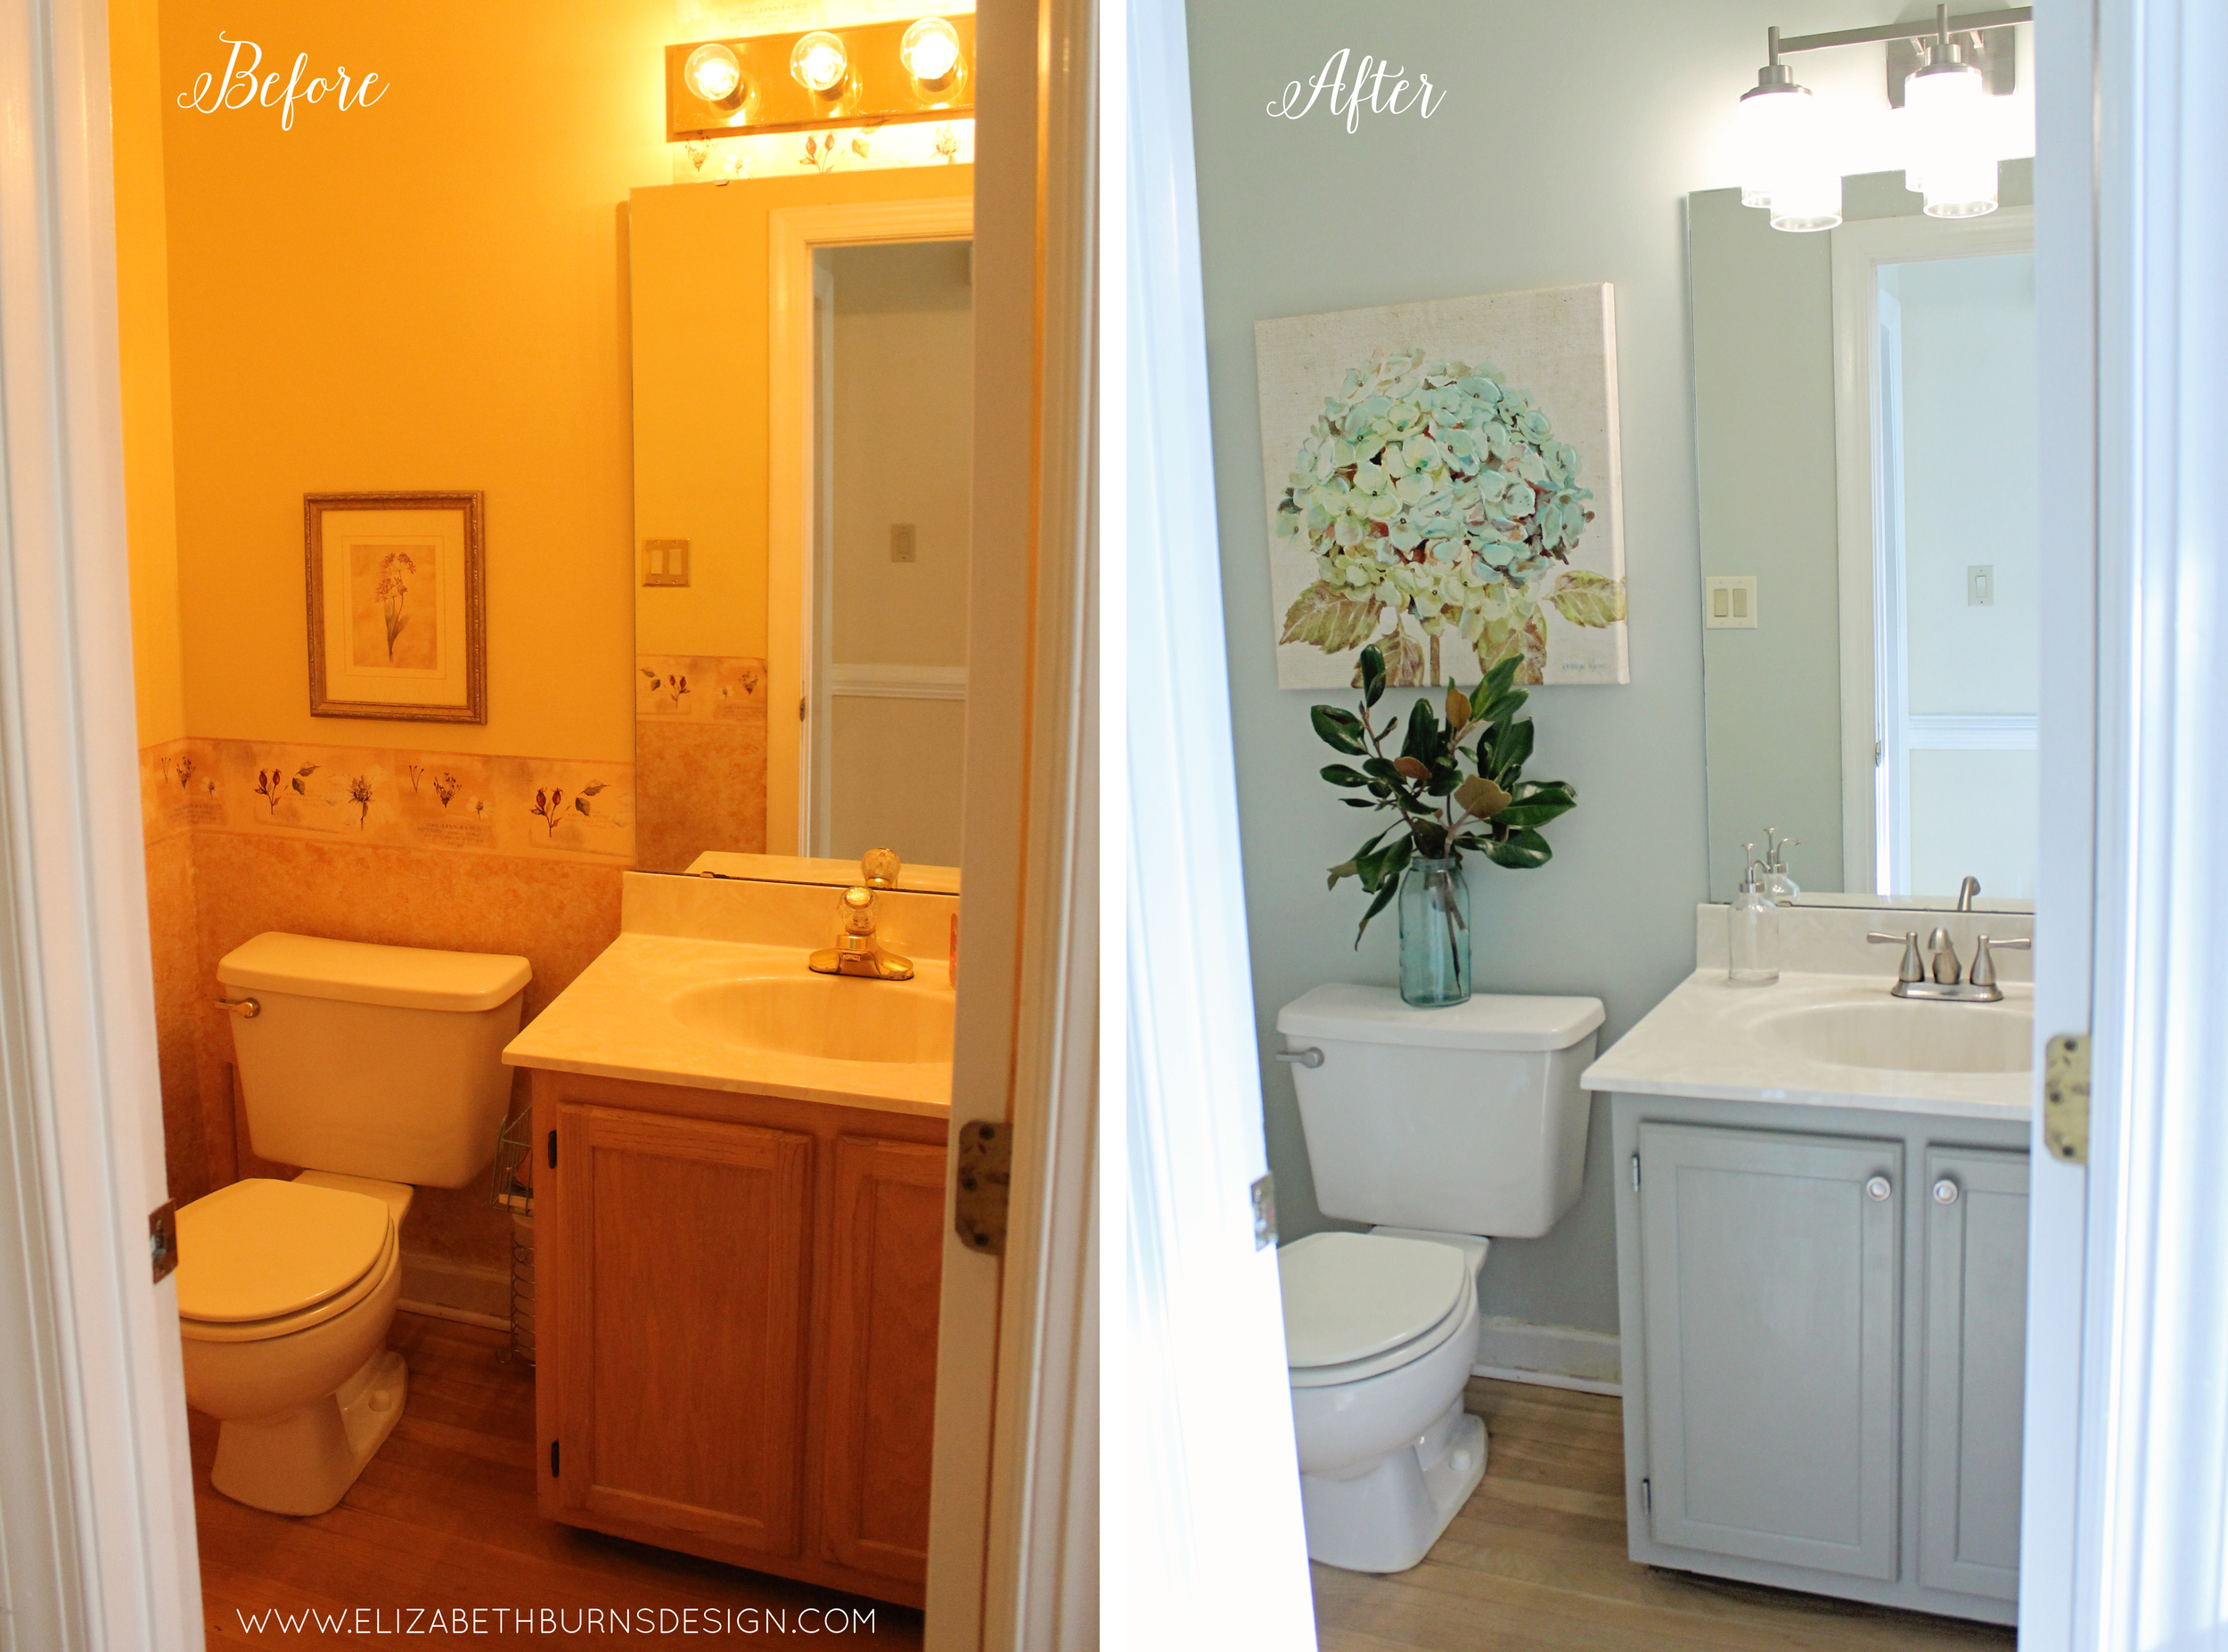 Elizabeth Burns Design | Raleigh NC Interior Designer - Budget Friendly Bathroom Makeover; Powder Room Renovation for $200